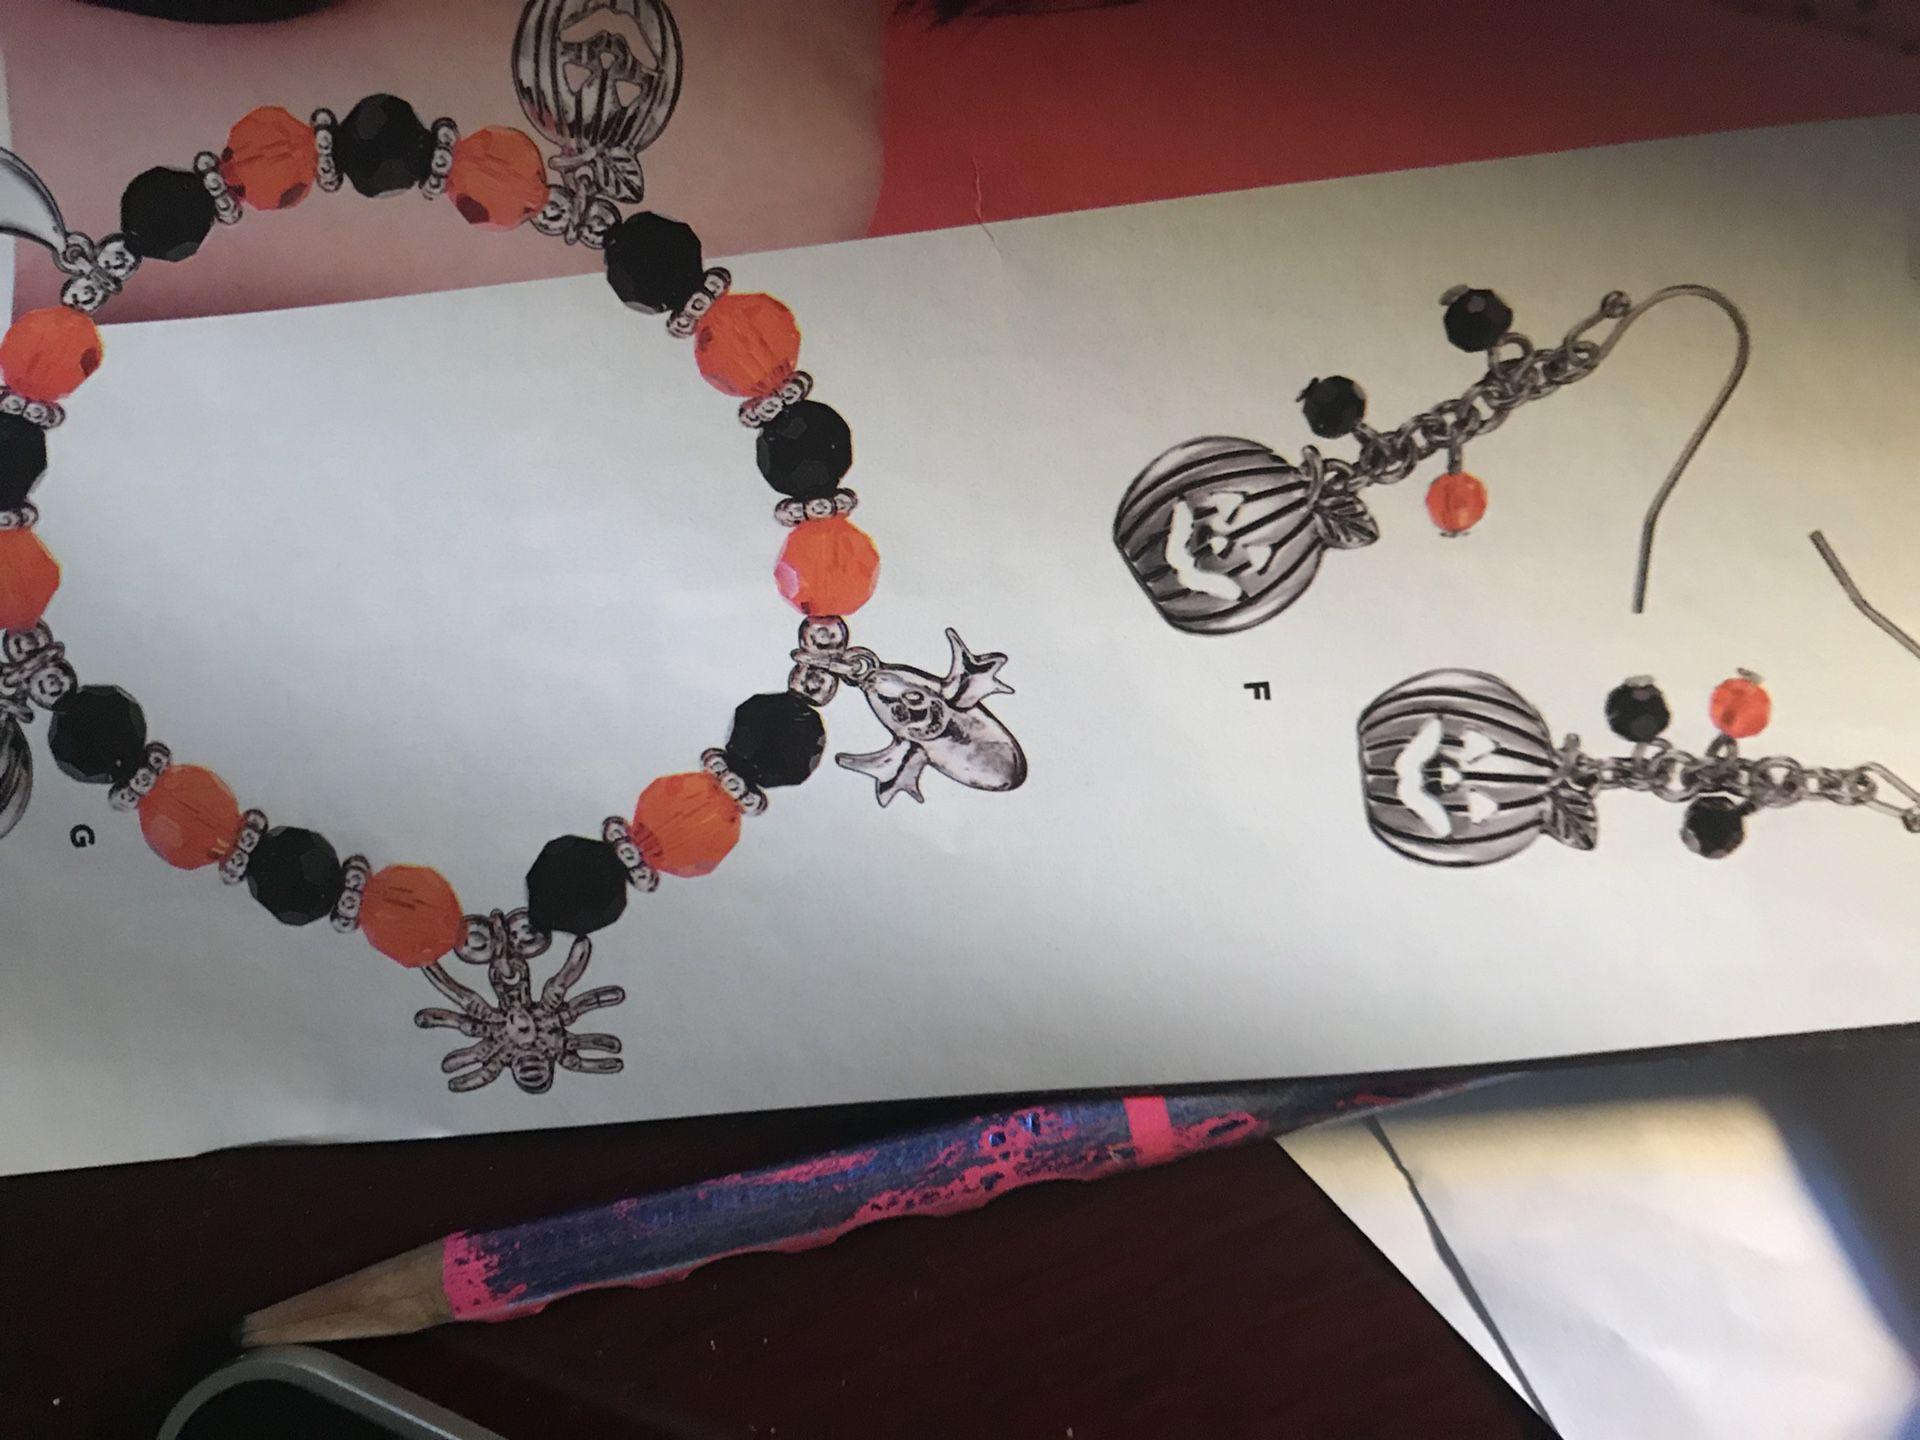 Assortment of Halloween decorations